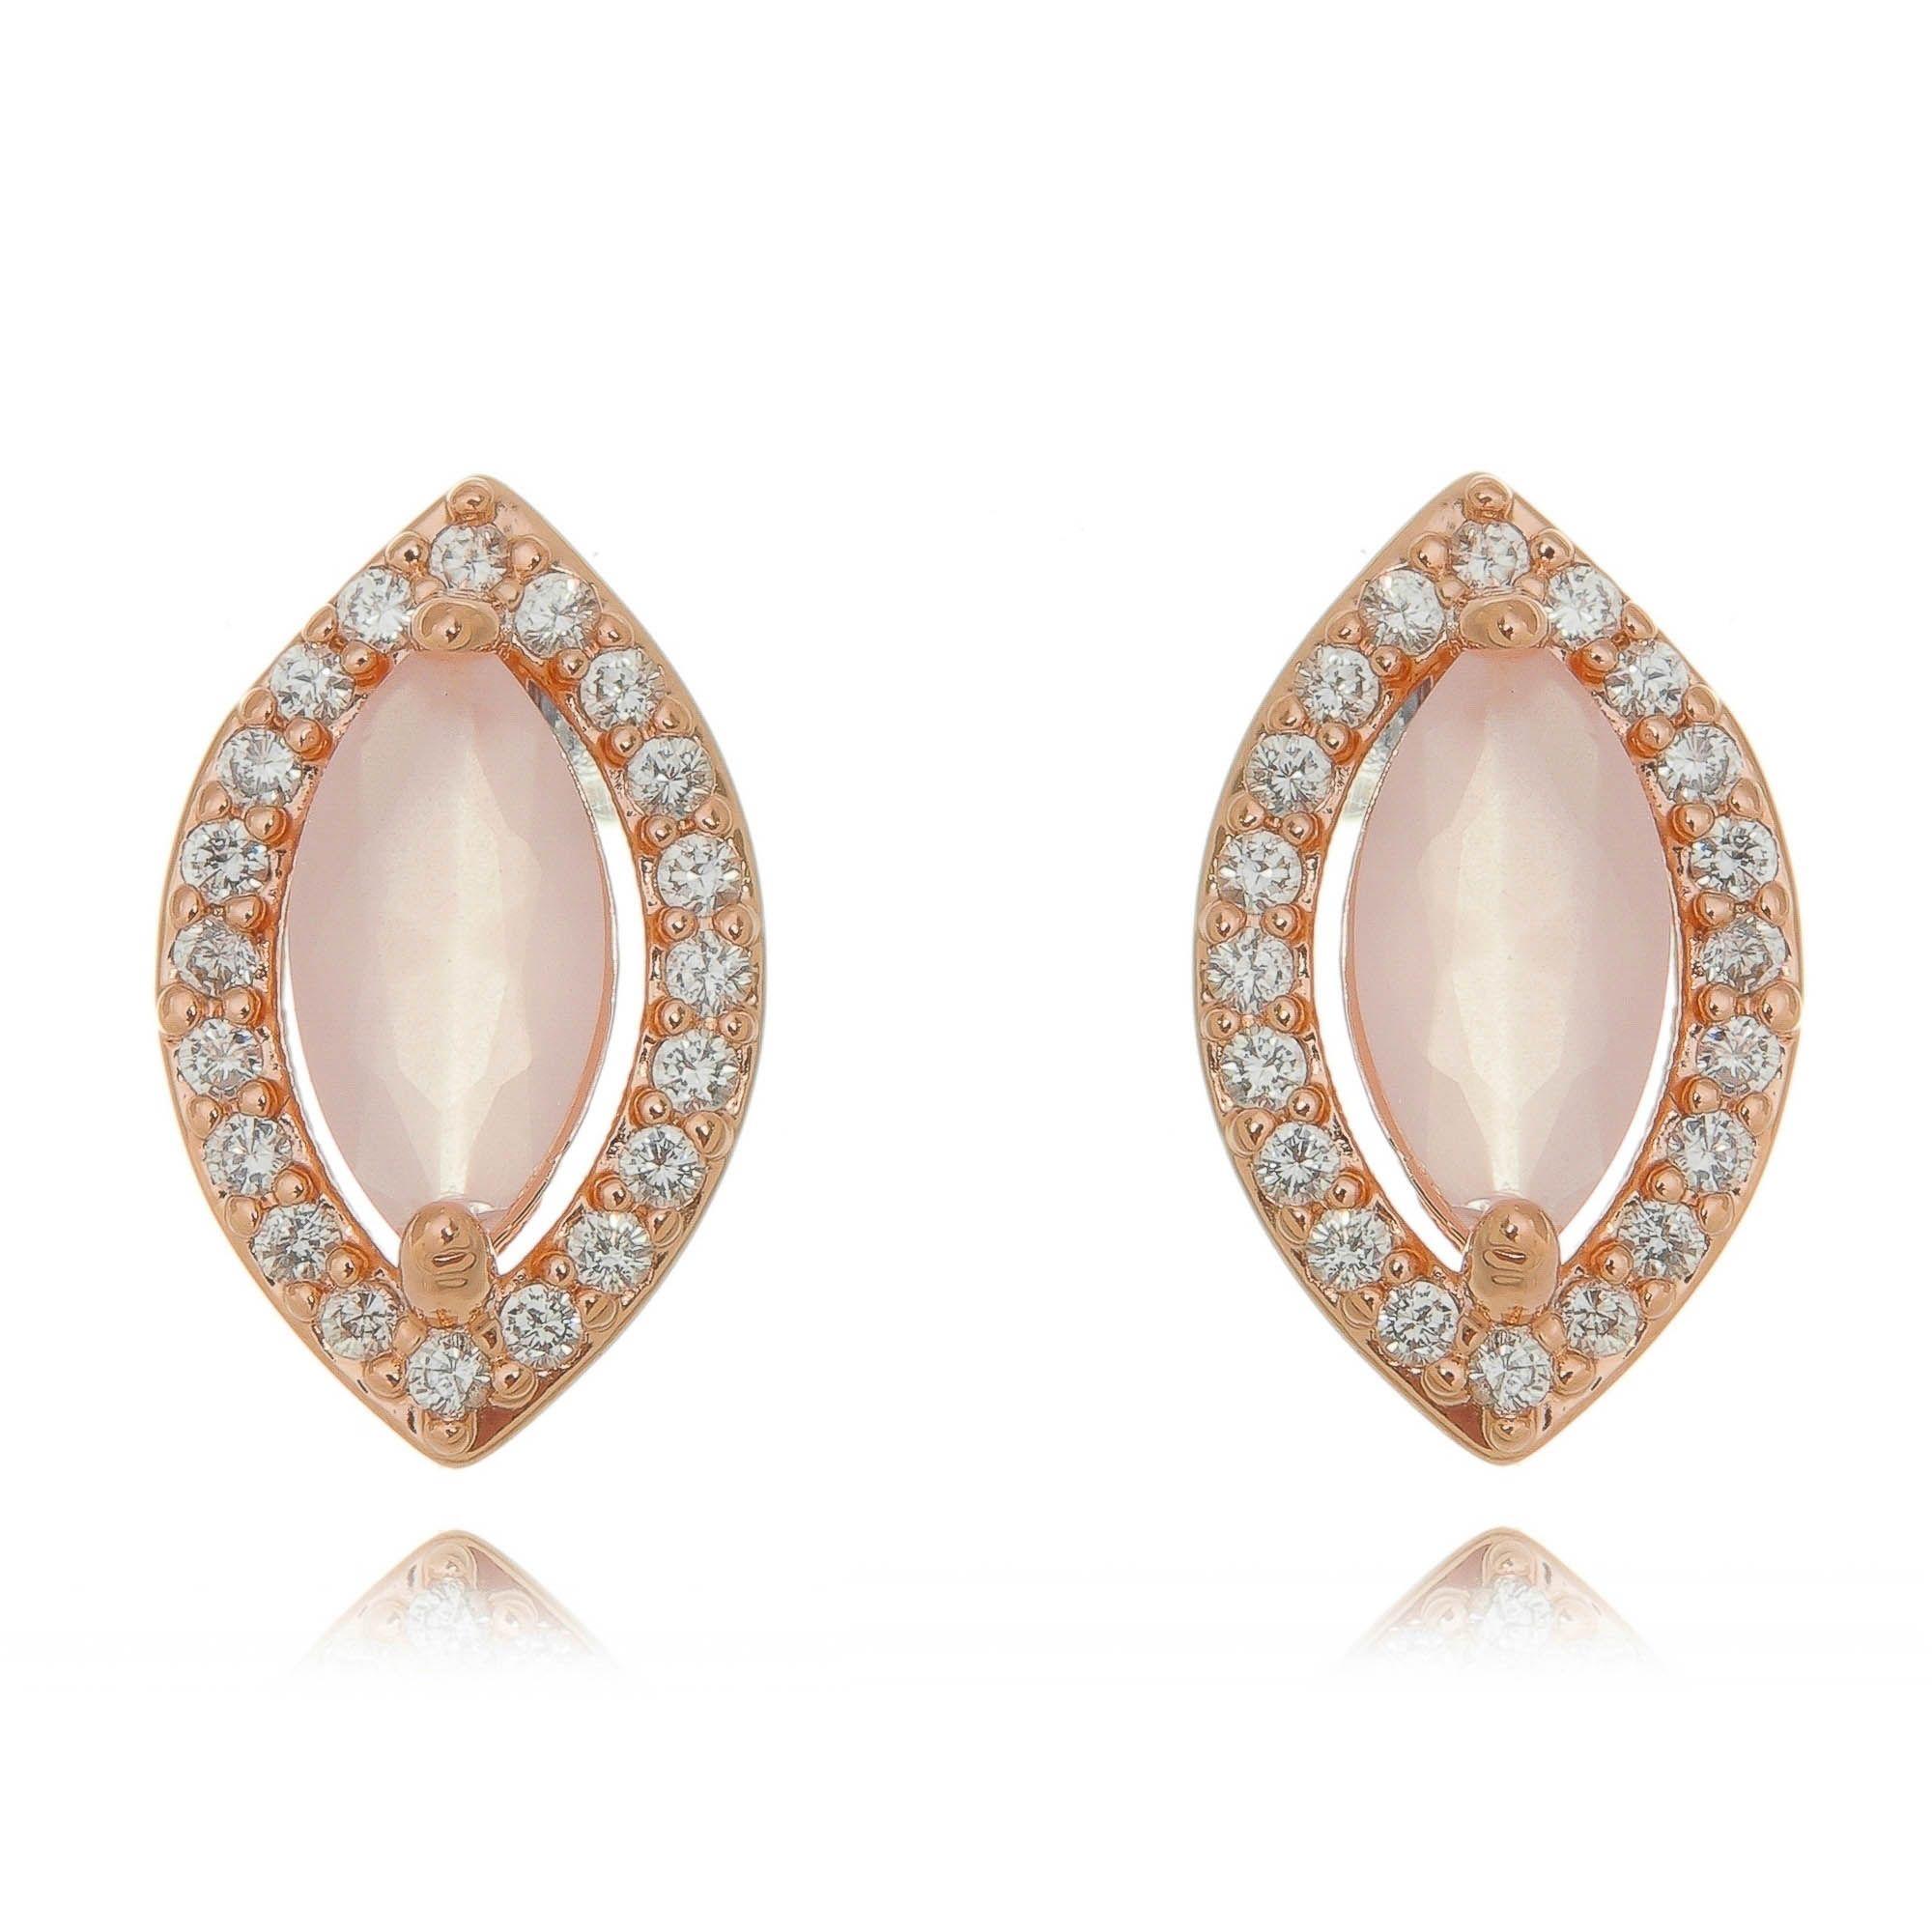 Brinco Ouro Rosé Quartzo Rosa e Zircônia Cristal Semijoia Fina  - Soloyou